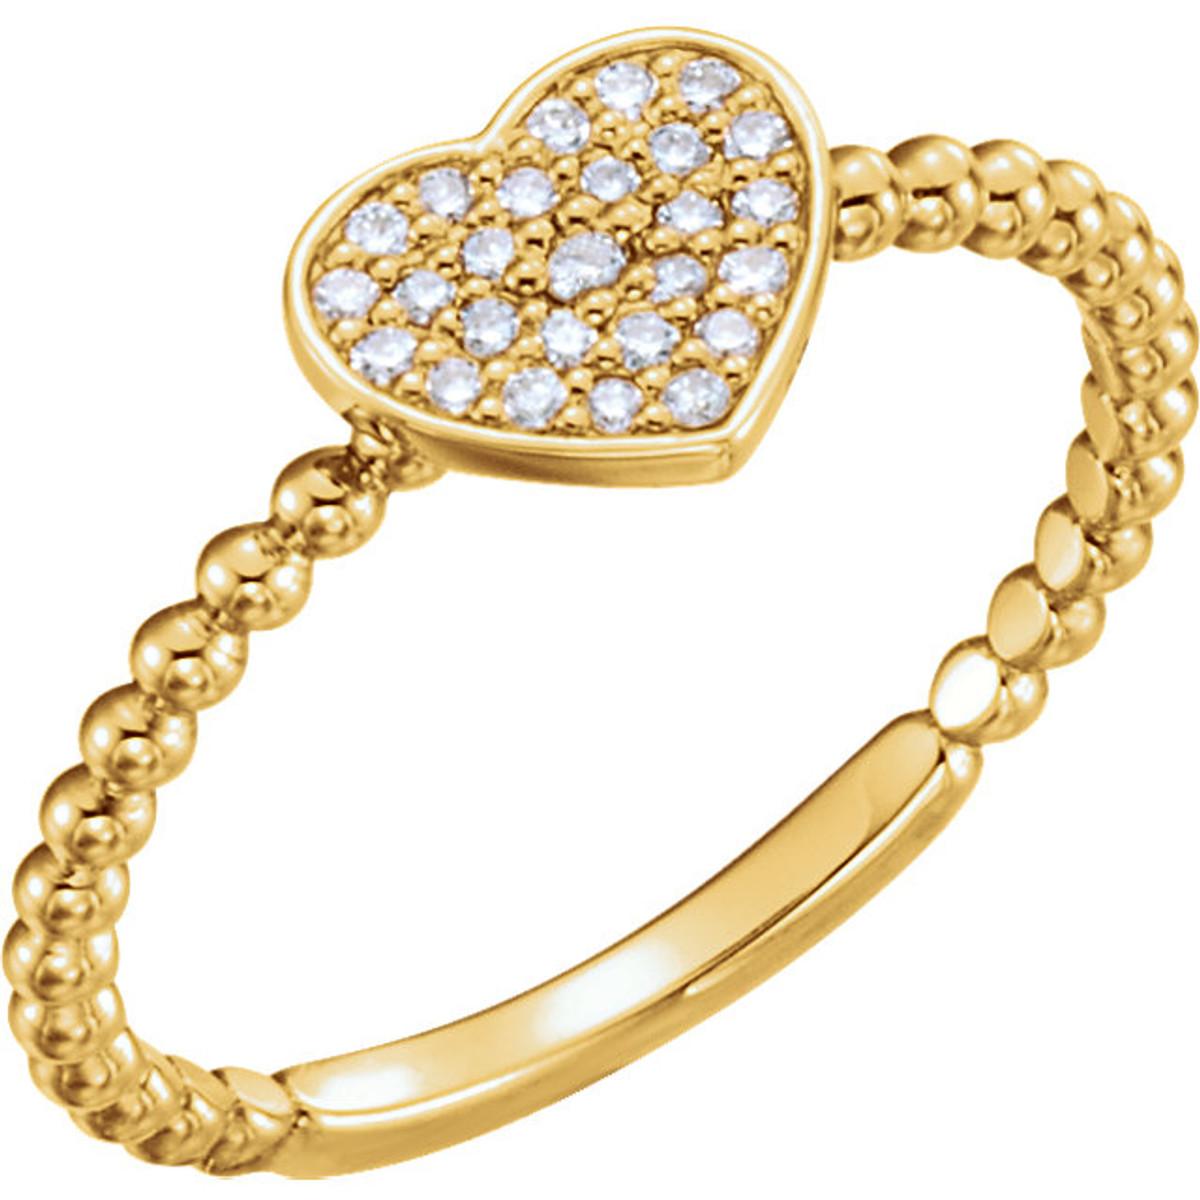 Yellow Gold Beaded Diamond Petite Heart Ring